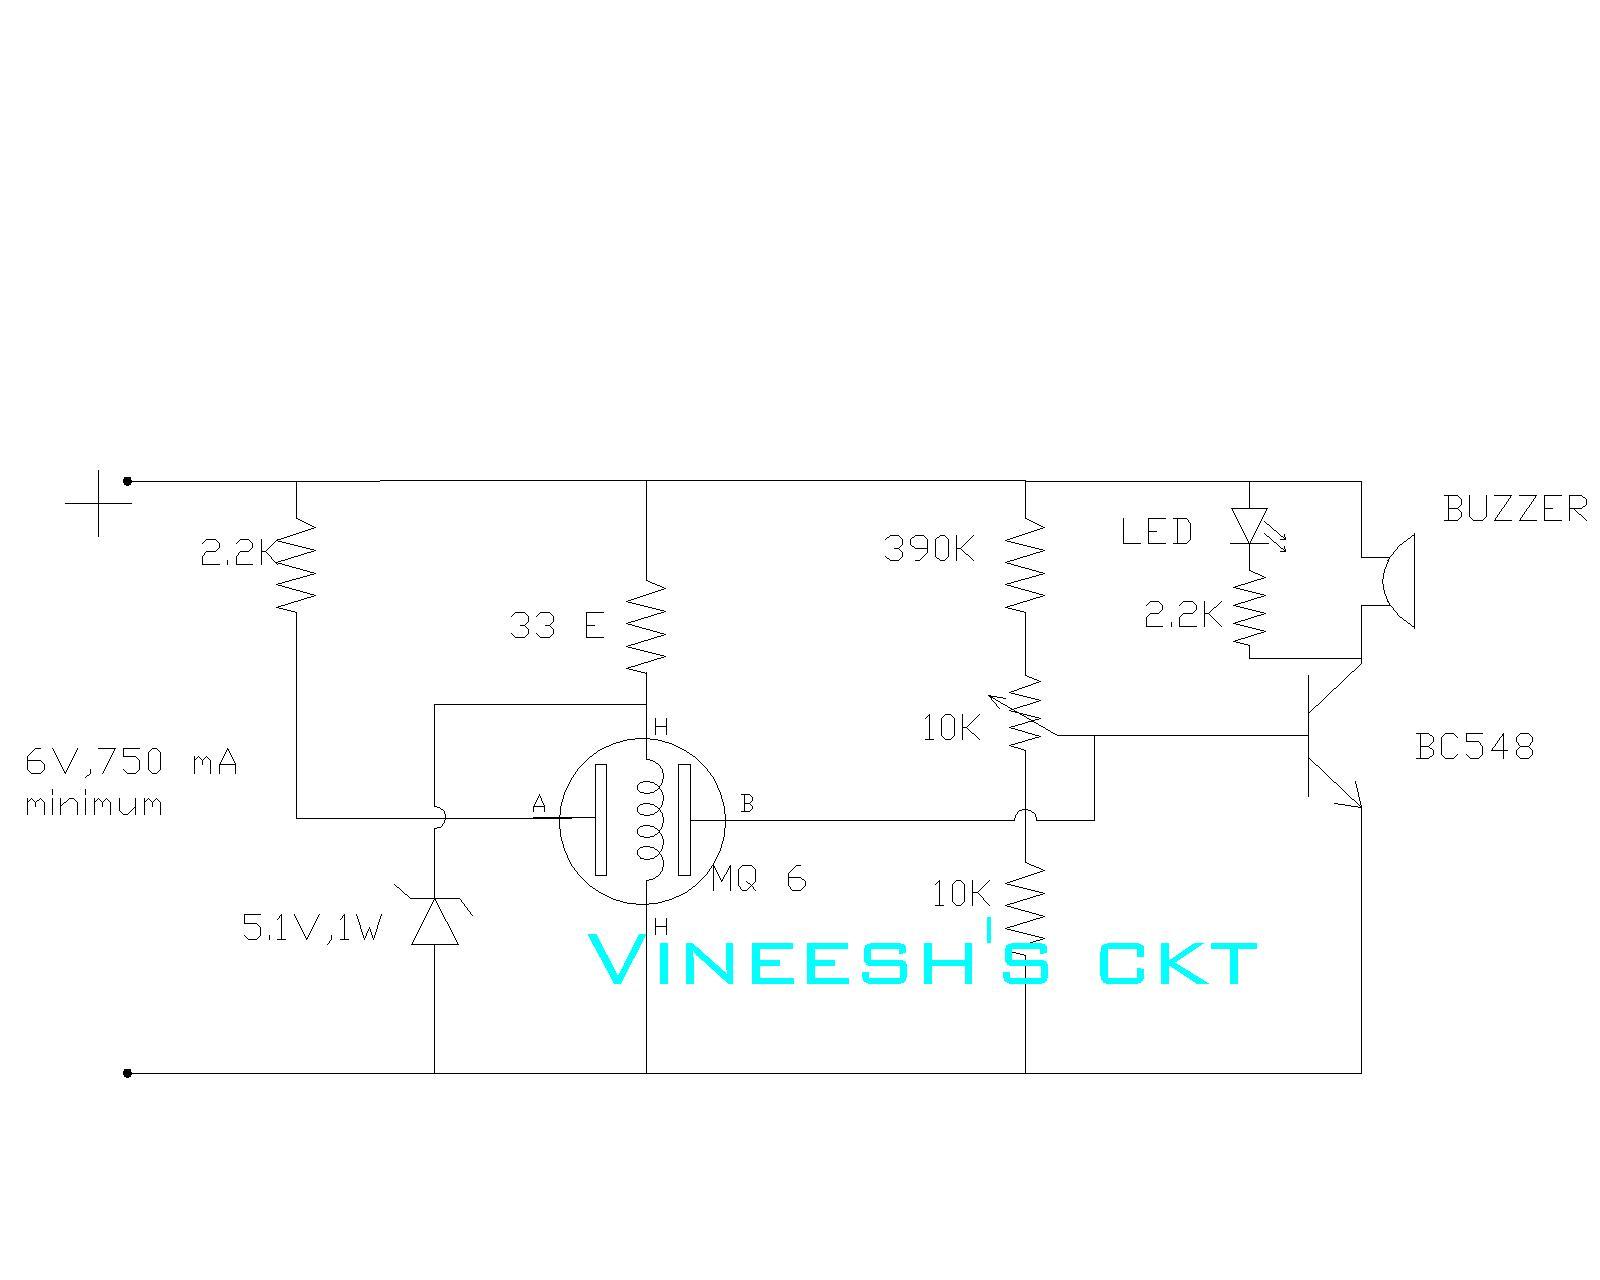 Mq 6 Circuit Diagram Automotive Wiring Electronic Blogspot Library Rh 9 Muehlwald De Ac Cd